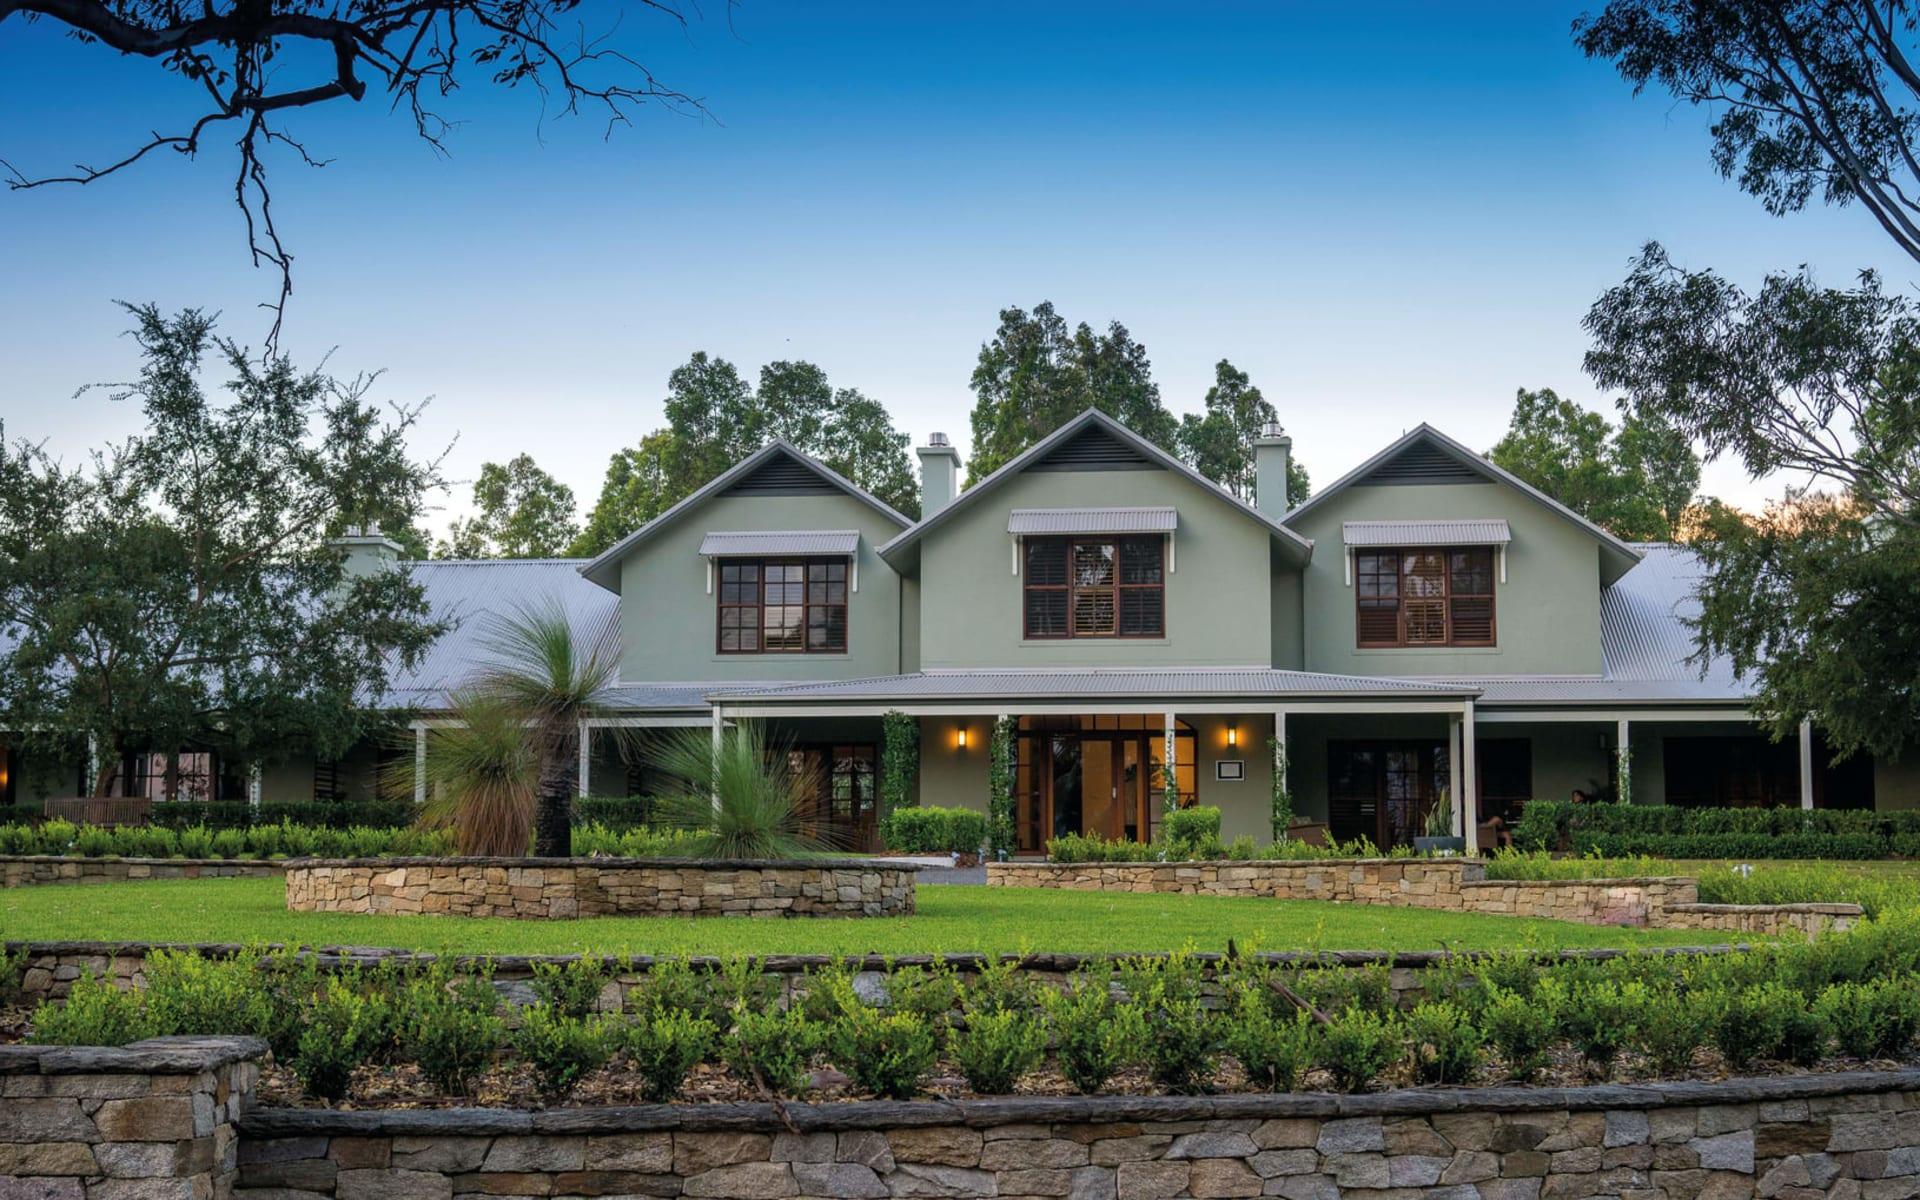 Spicers Vineyards Estate in Pokolbin - Hunter Valley:  Spicers Vineyard Estate - Aussenansicht